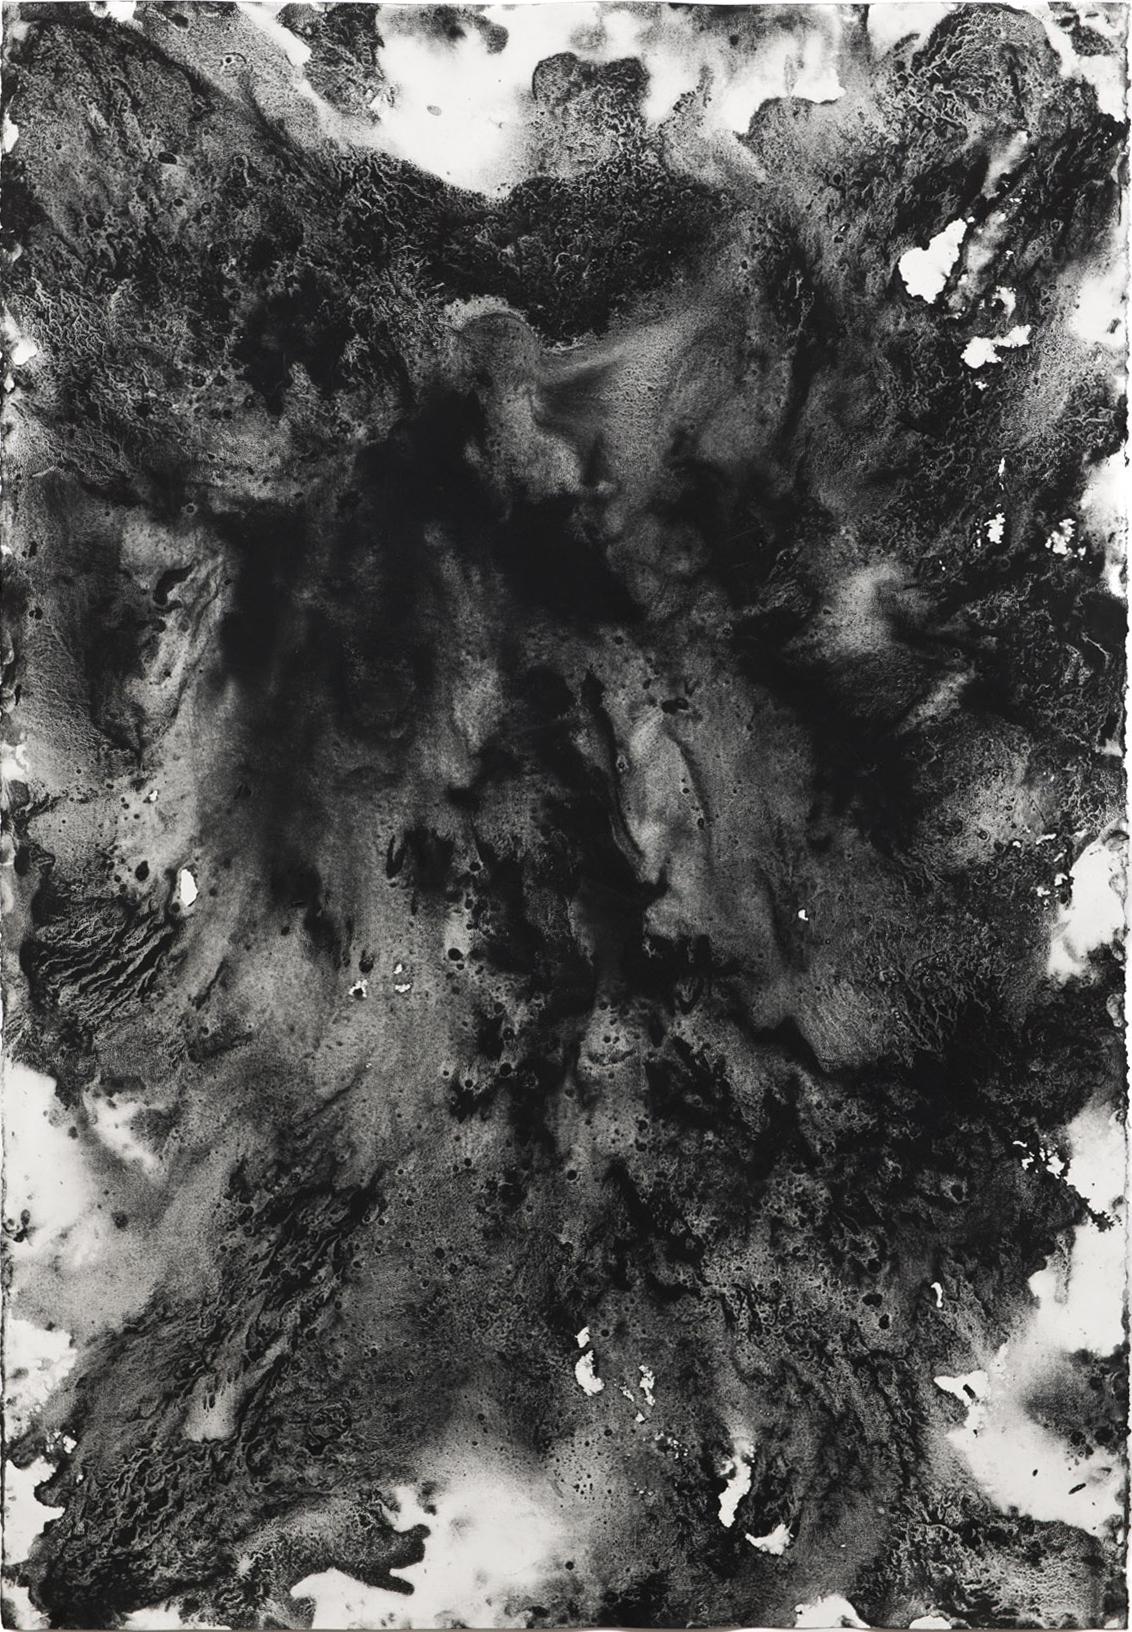 "Carl Trahan, Ohne Titel 2 , 2018, graphite on paper, 44"" x 30"" (111 x 77 cm)"